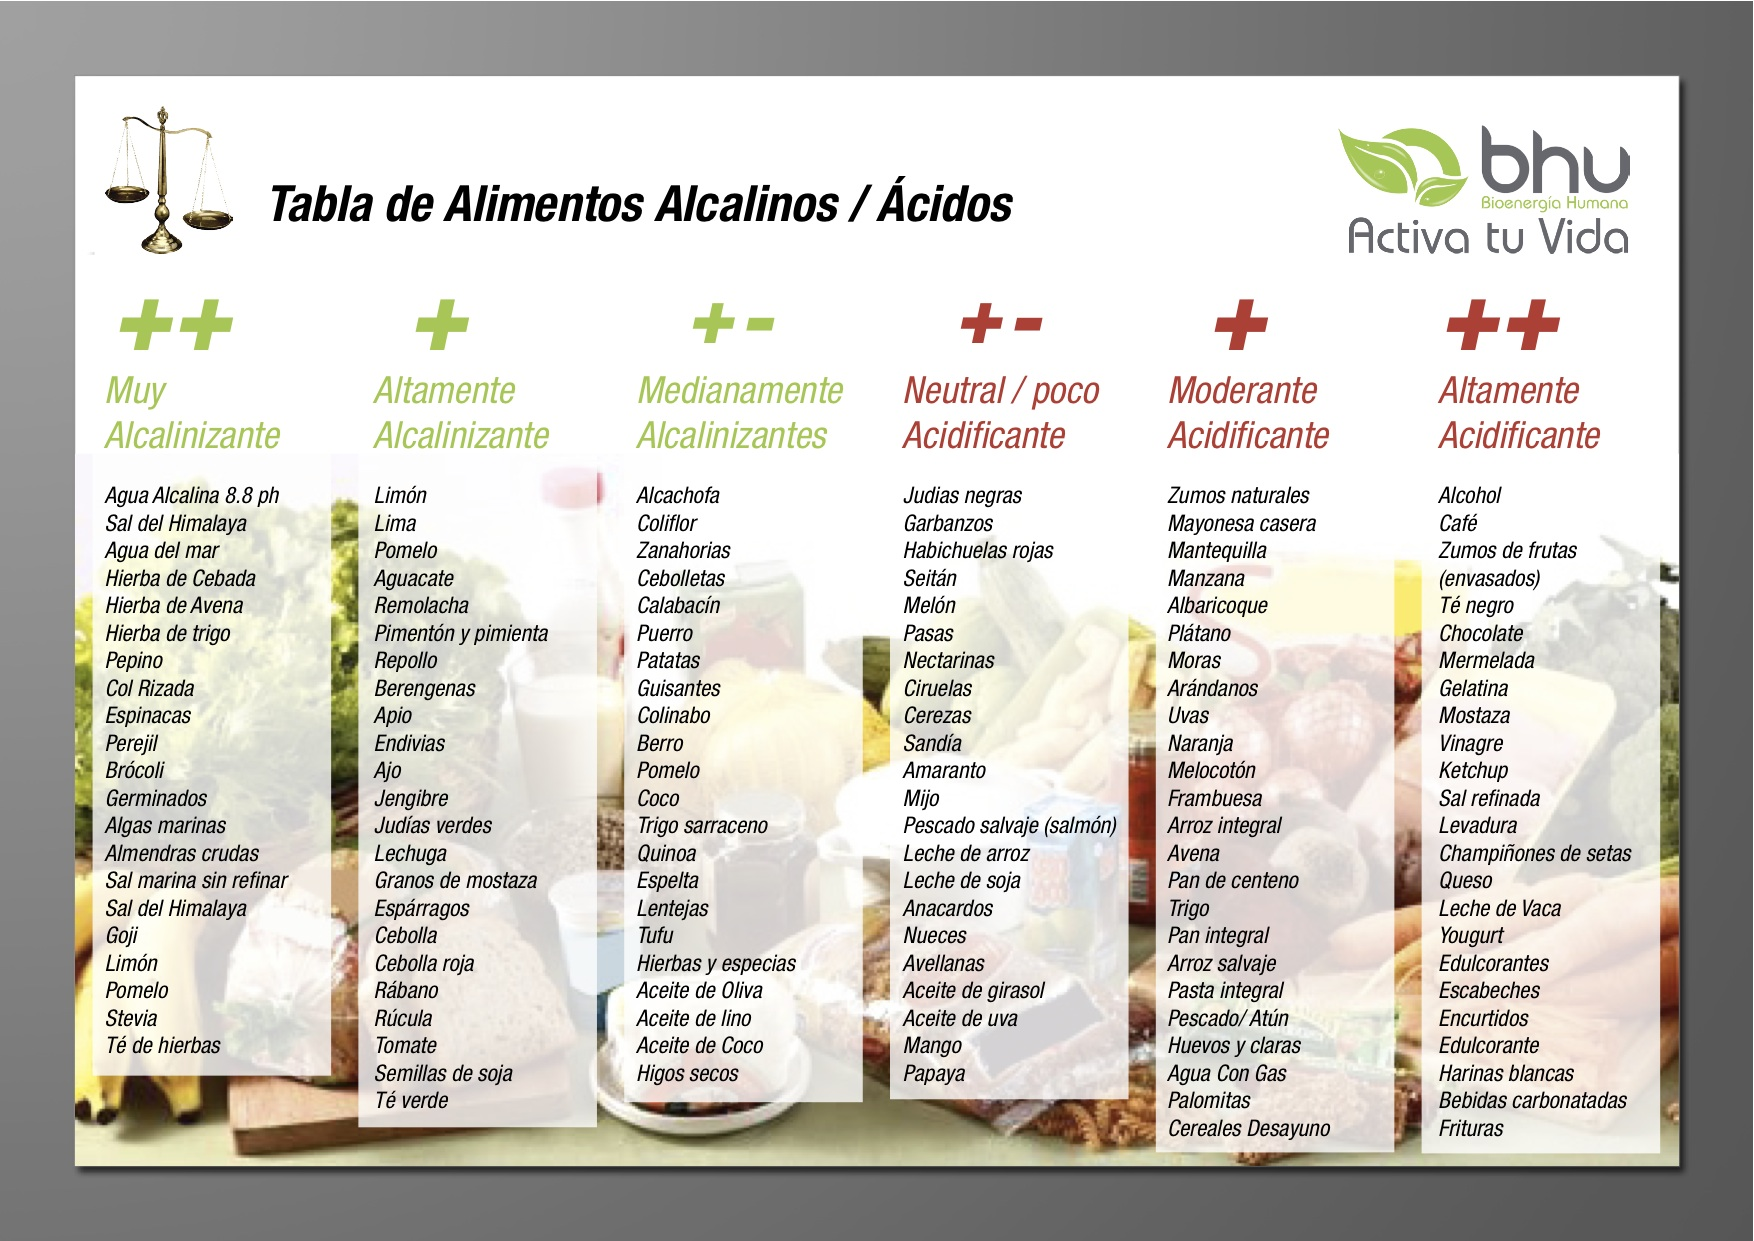 Tabla Comparativa. Fuente: /www.periodicodecrecimientopersonal.com